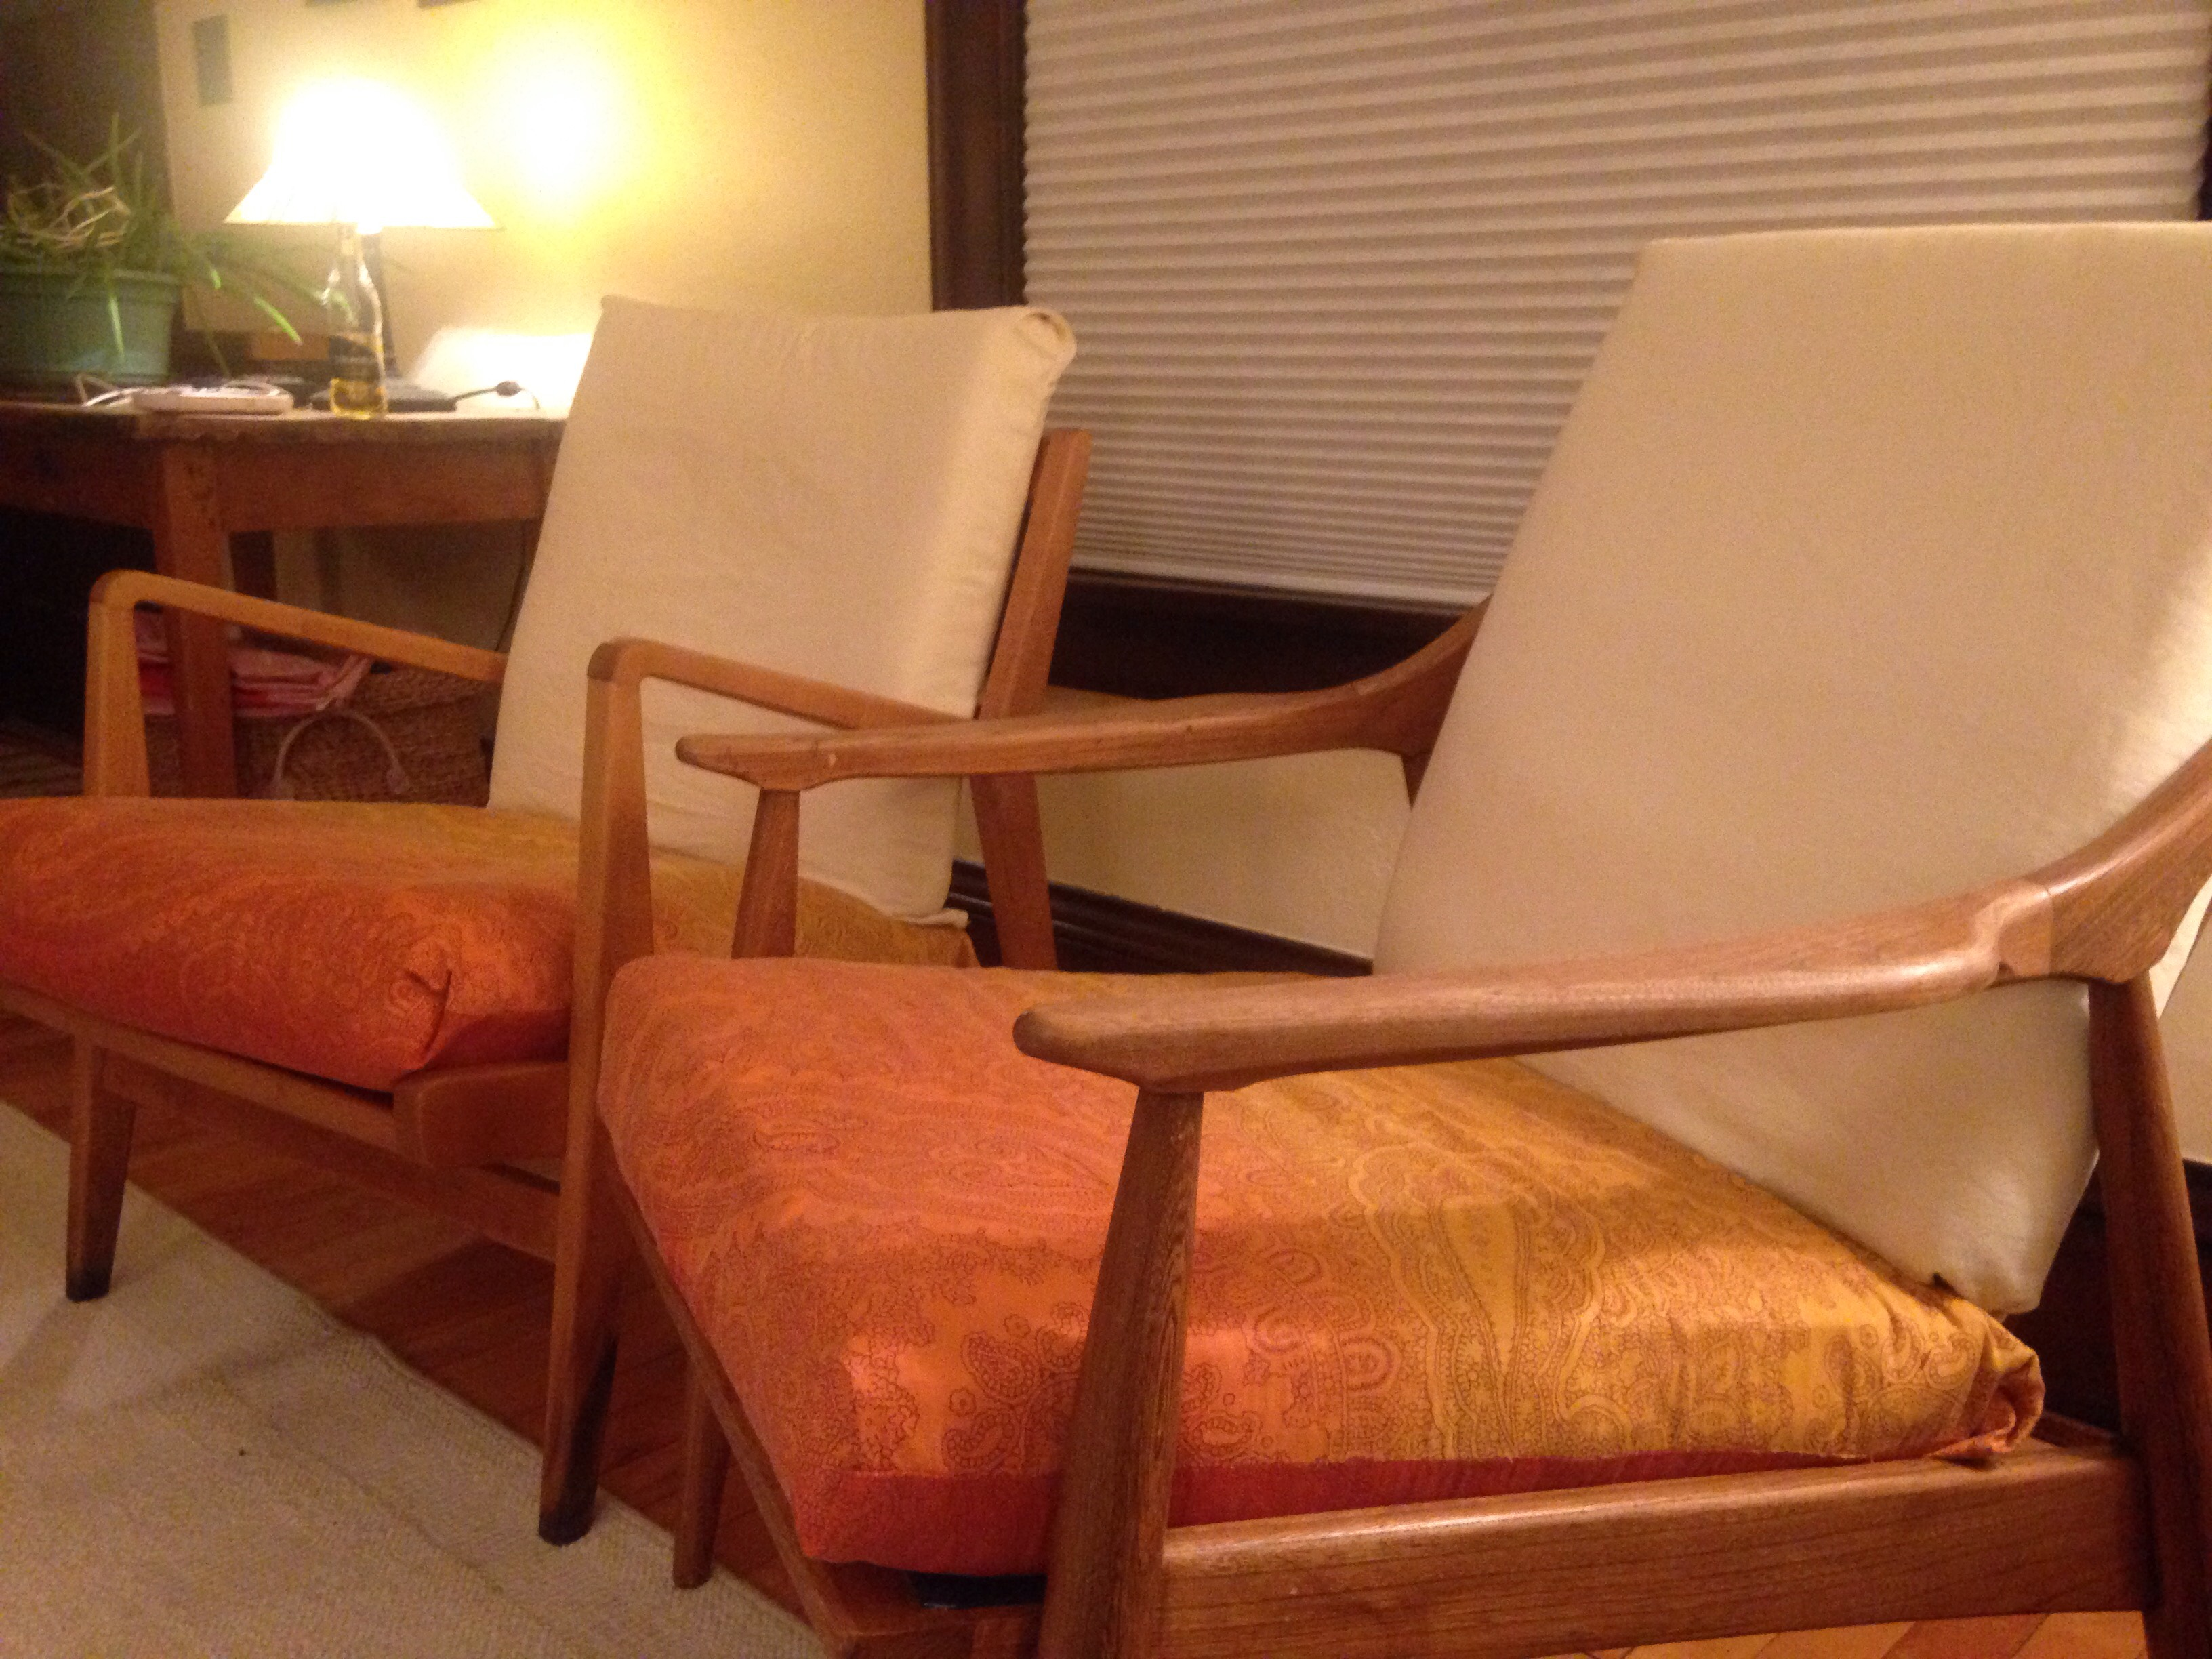 diy latex chair